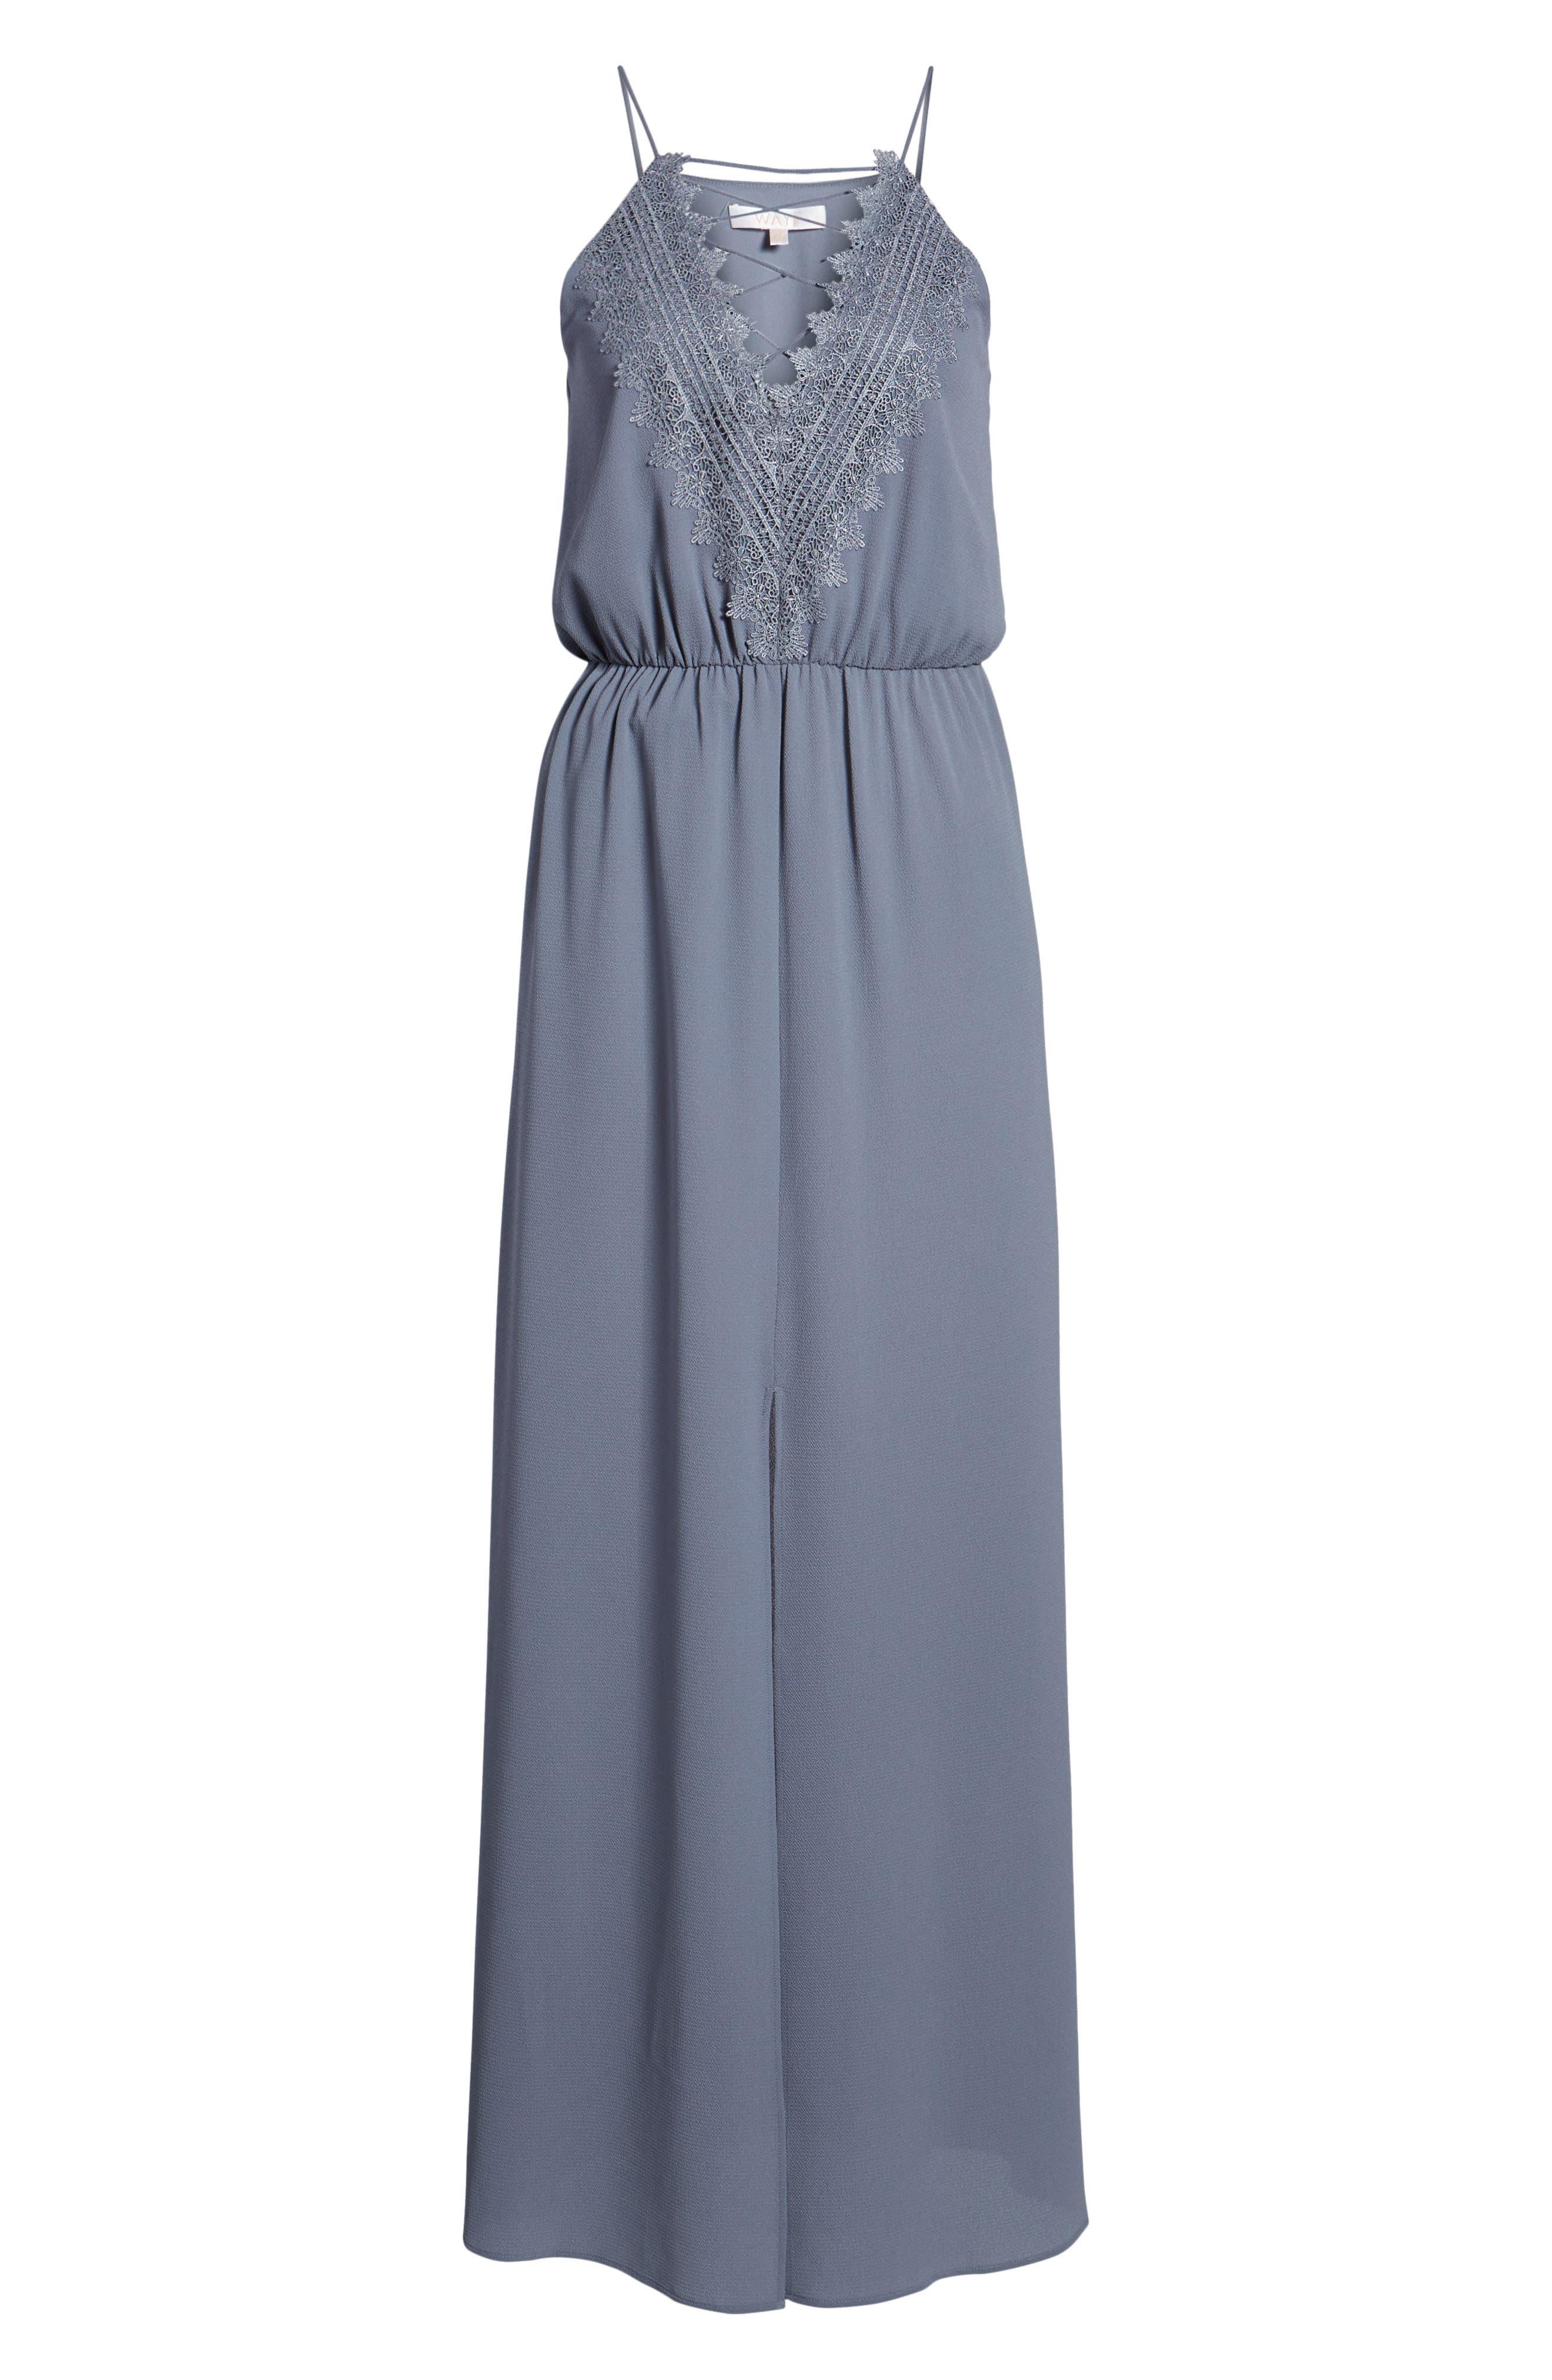 WAYF, Posie Maxi Dress, Alternate thumbnail 7, color, 027